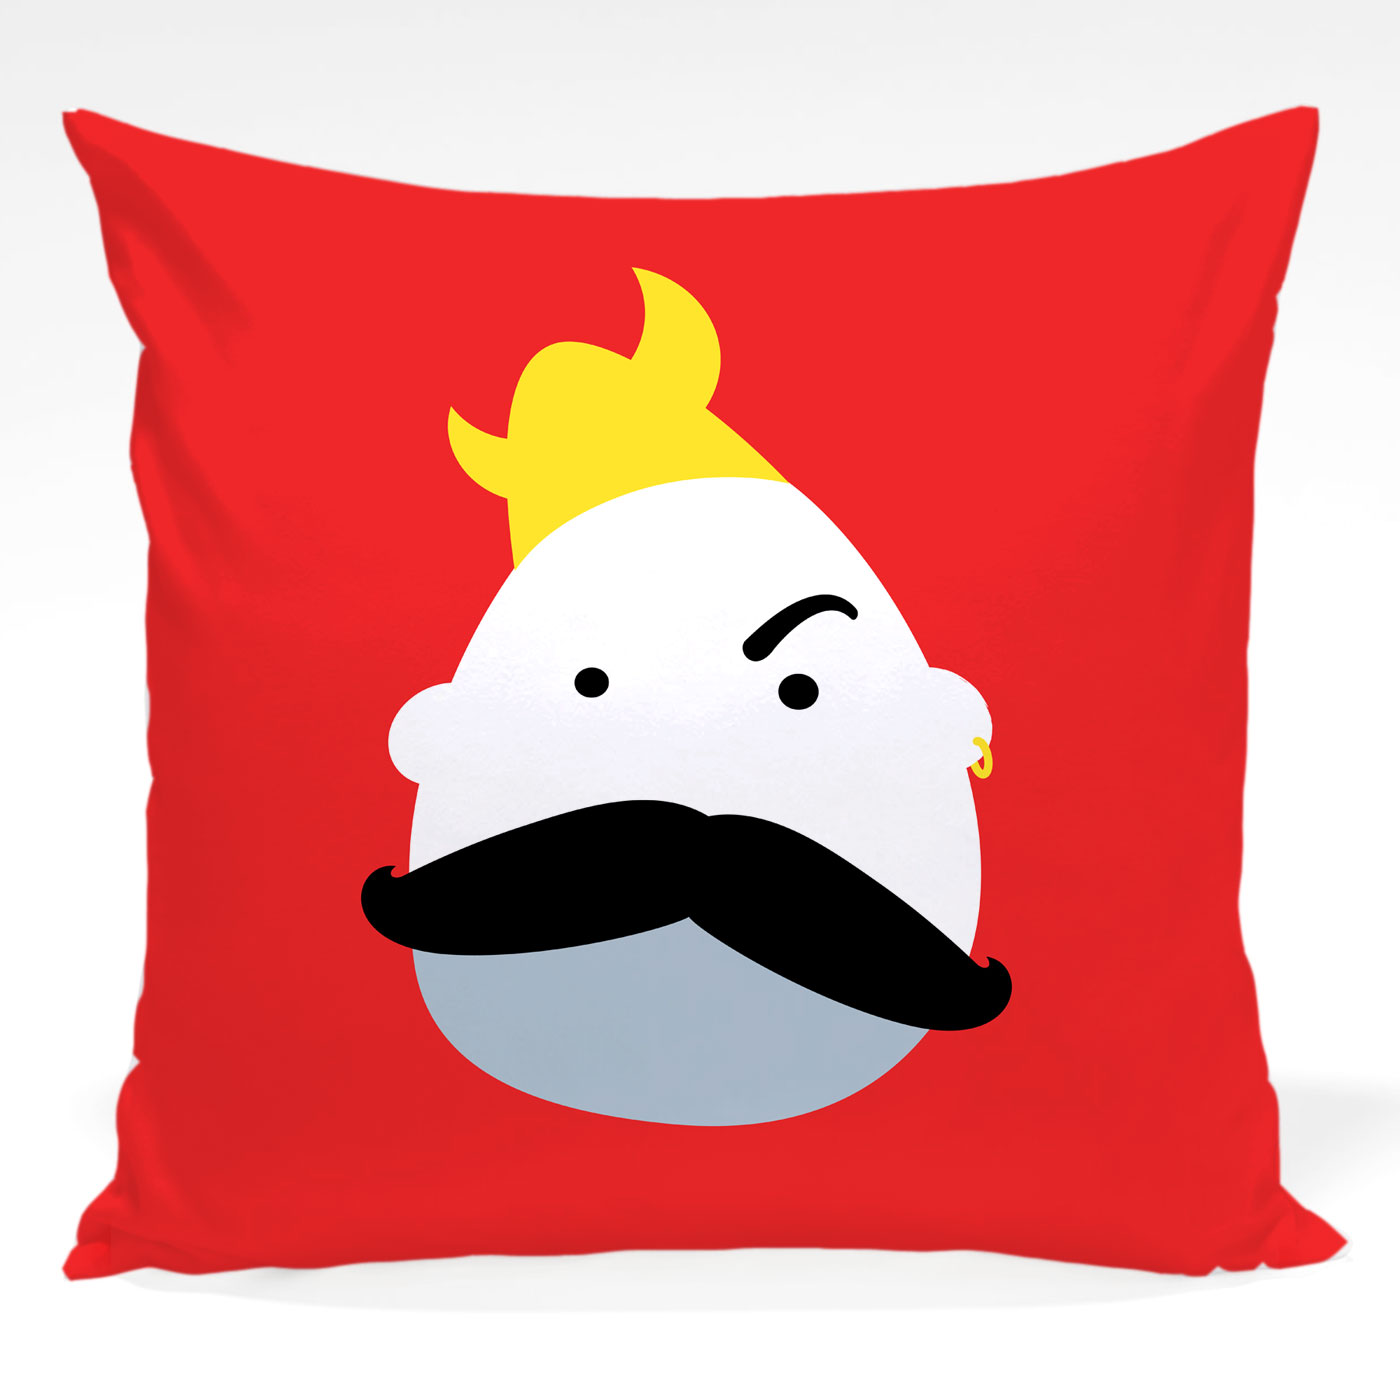 PMB222: Ironic Viking Pillow